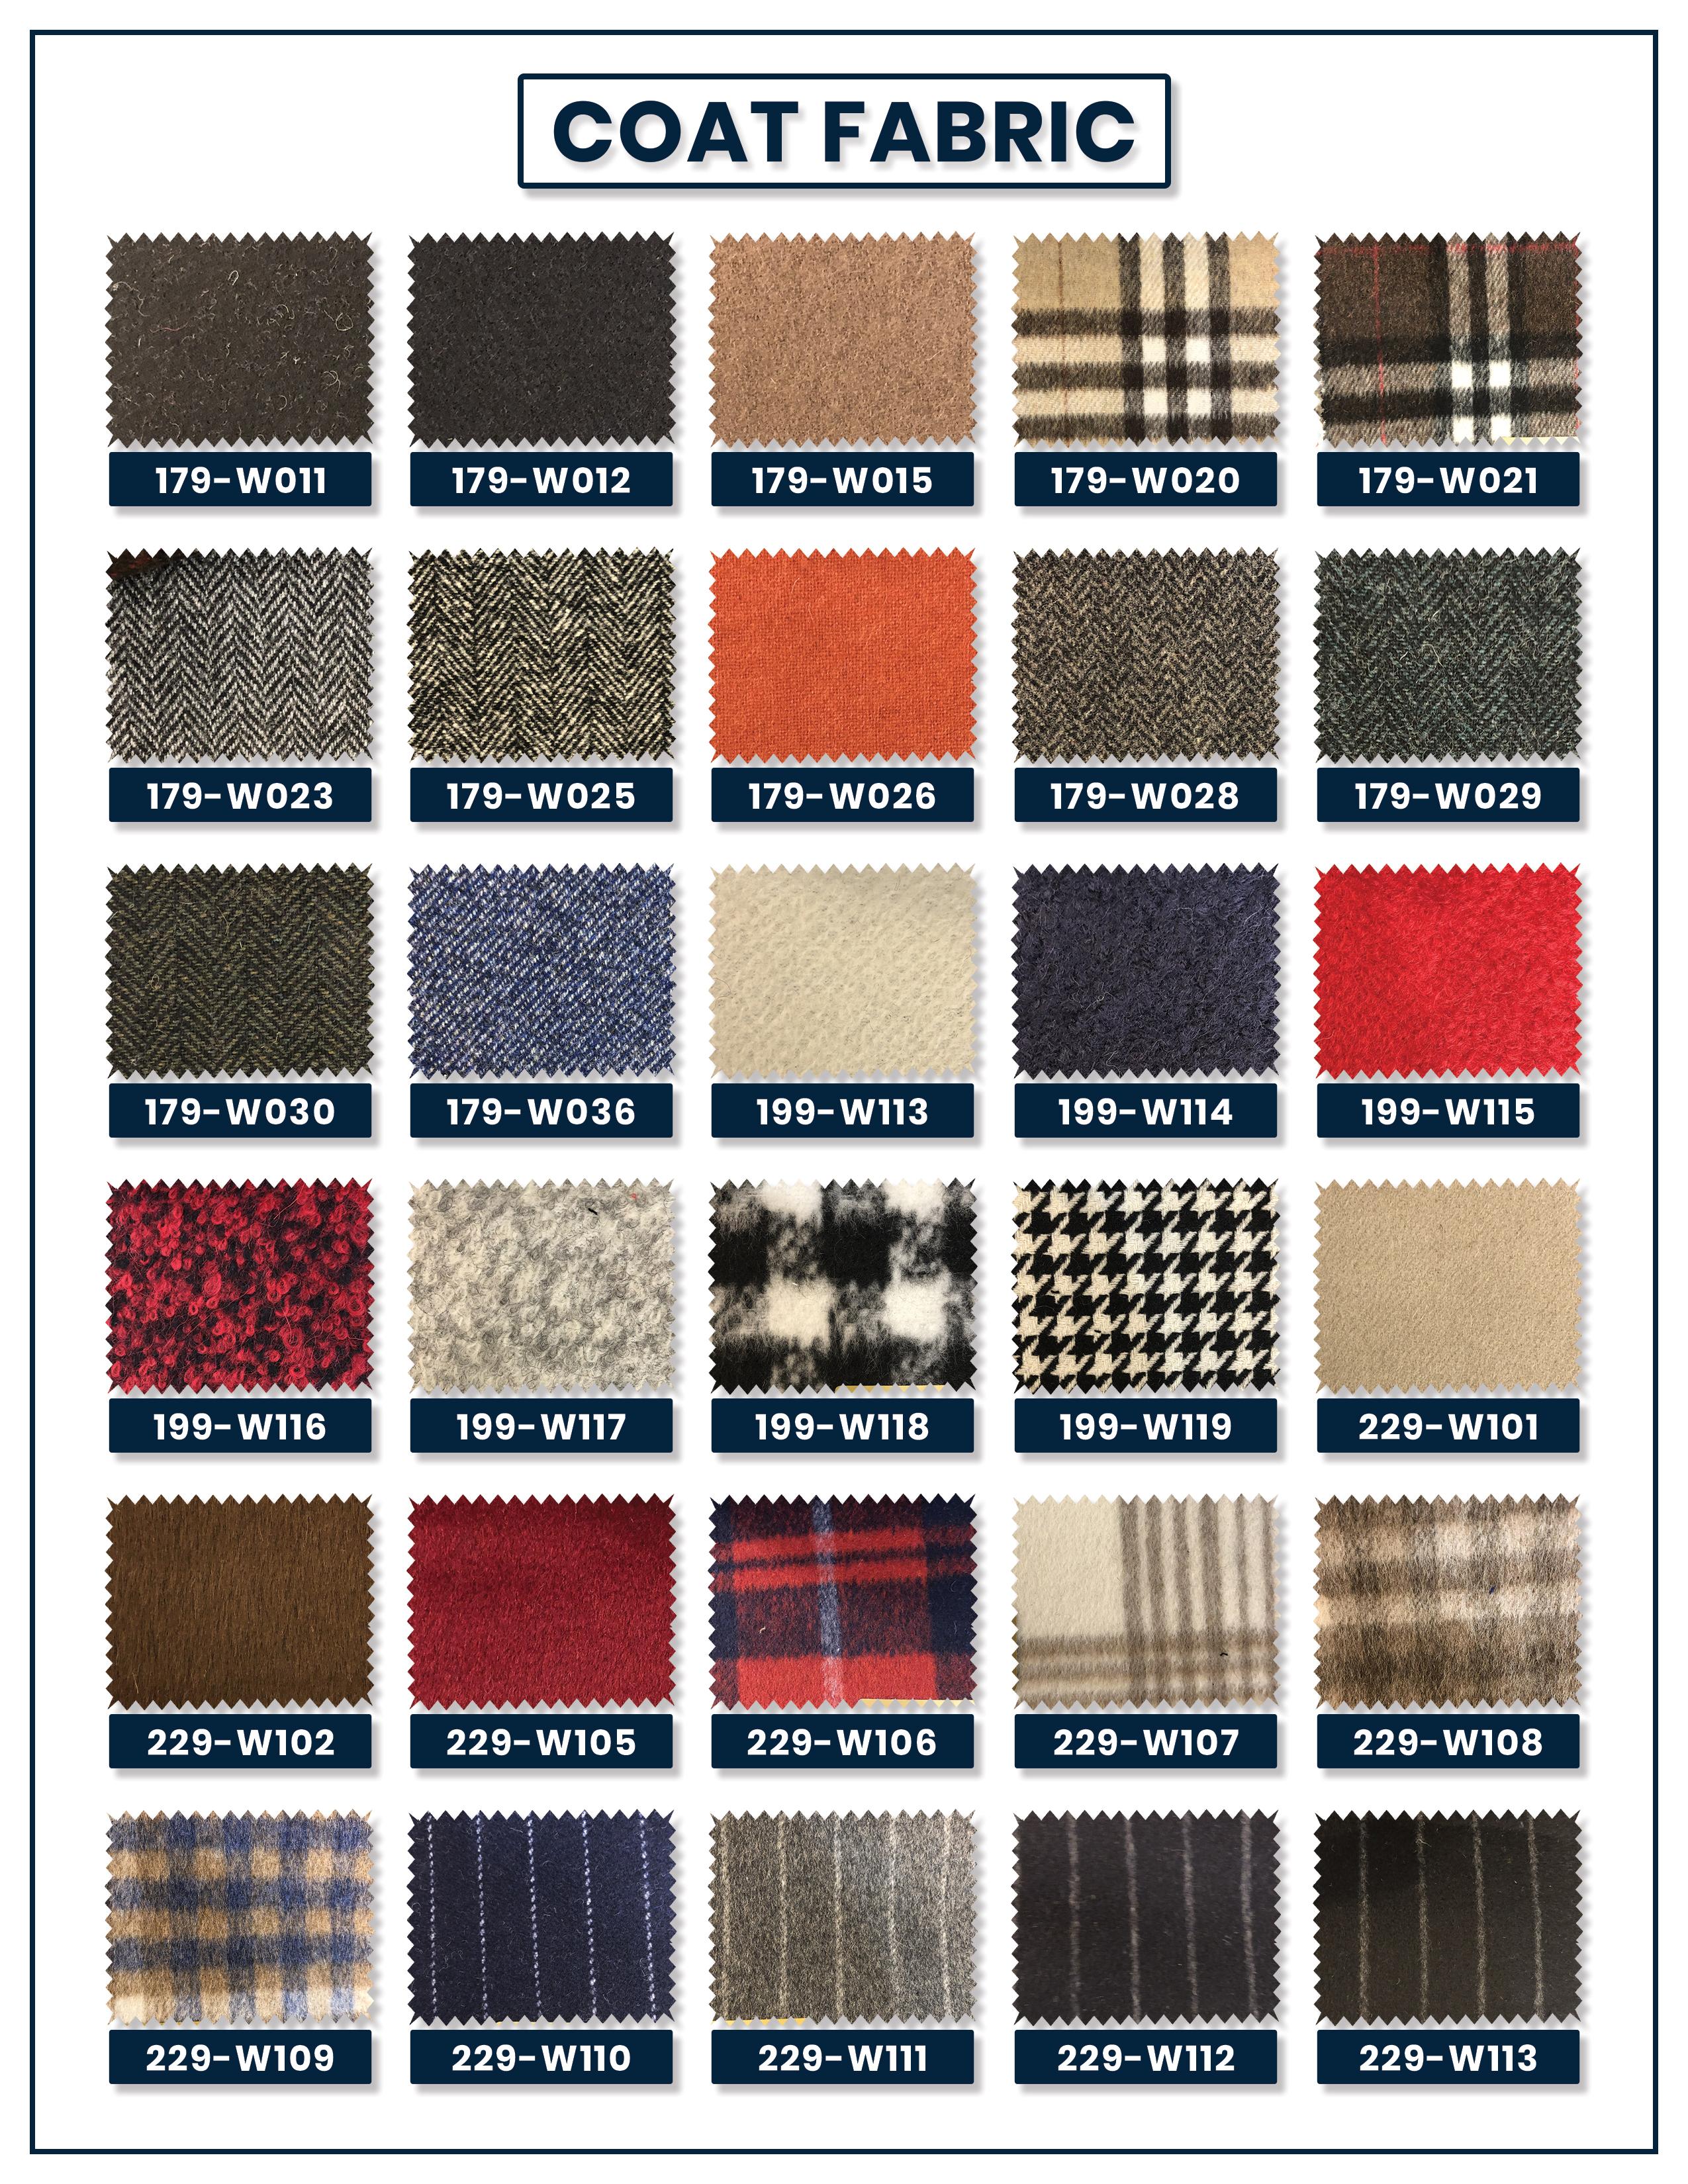 coat-fabric-rgb-.jpg